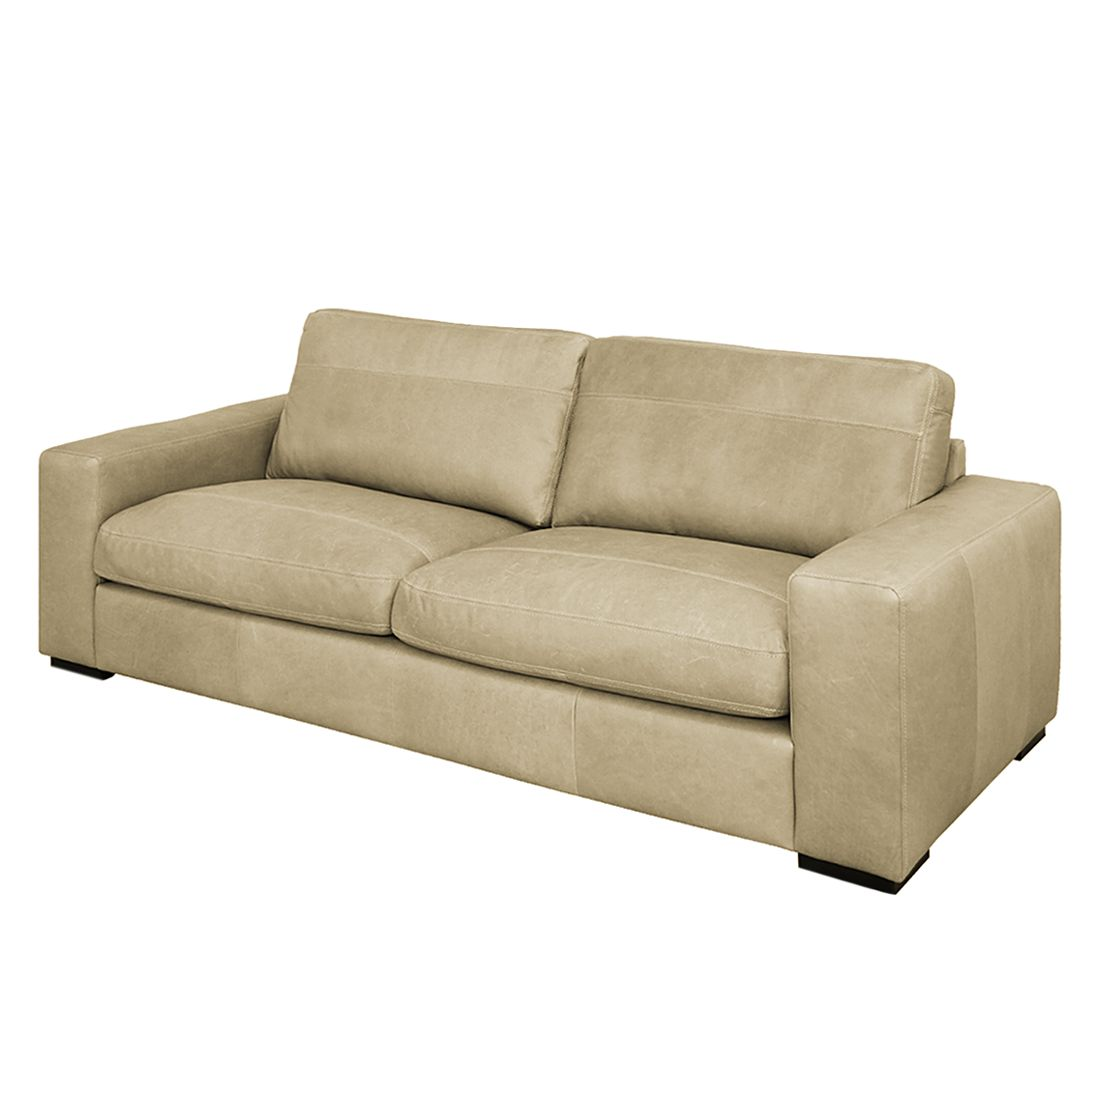 Sofa Riton (3-Sitzer) - Echtleder - Taupe, Nuovoform